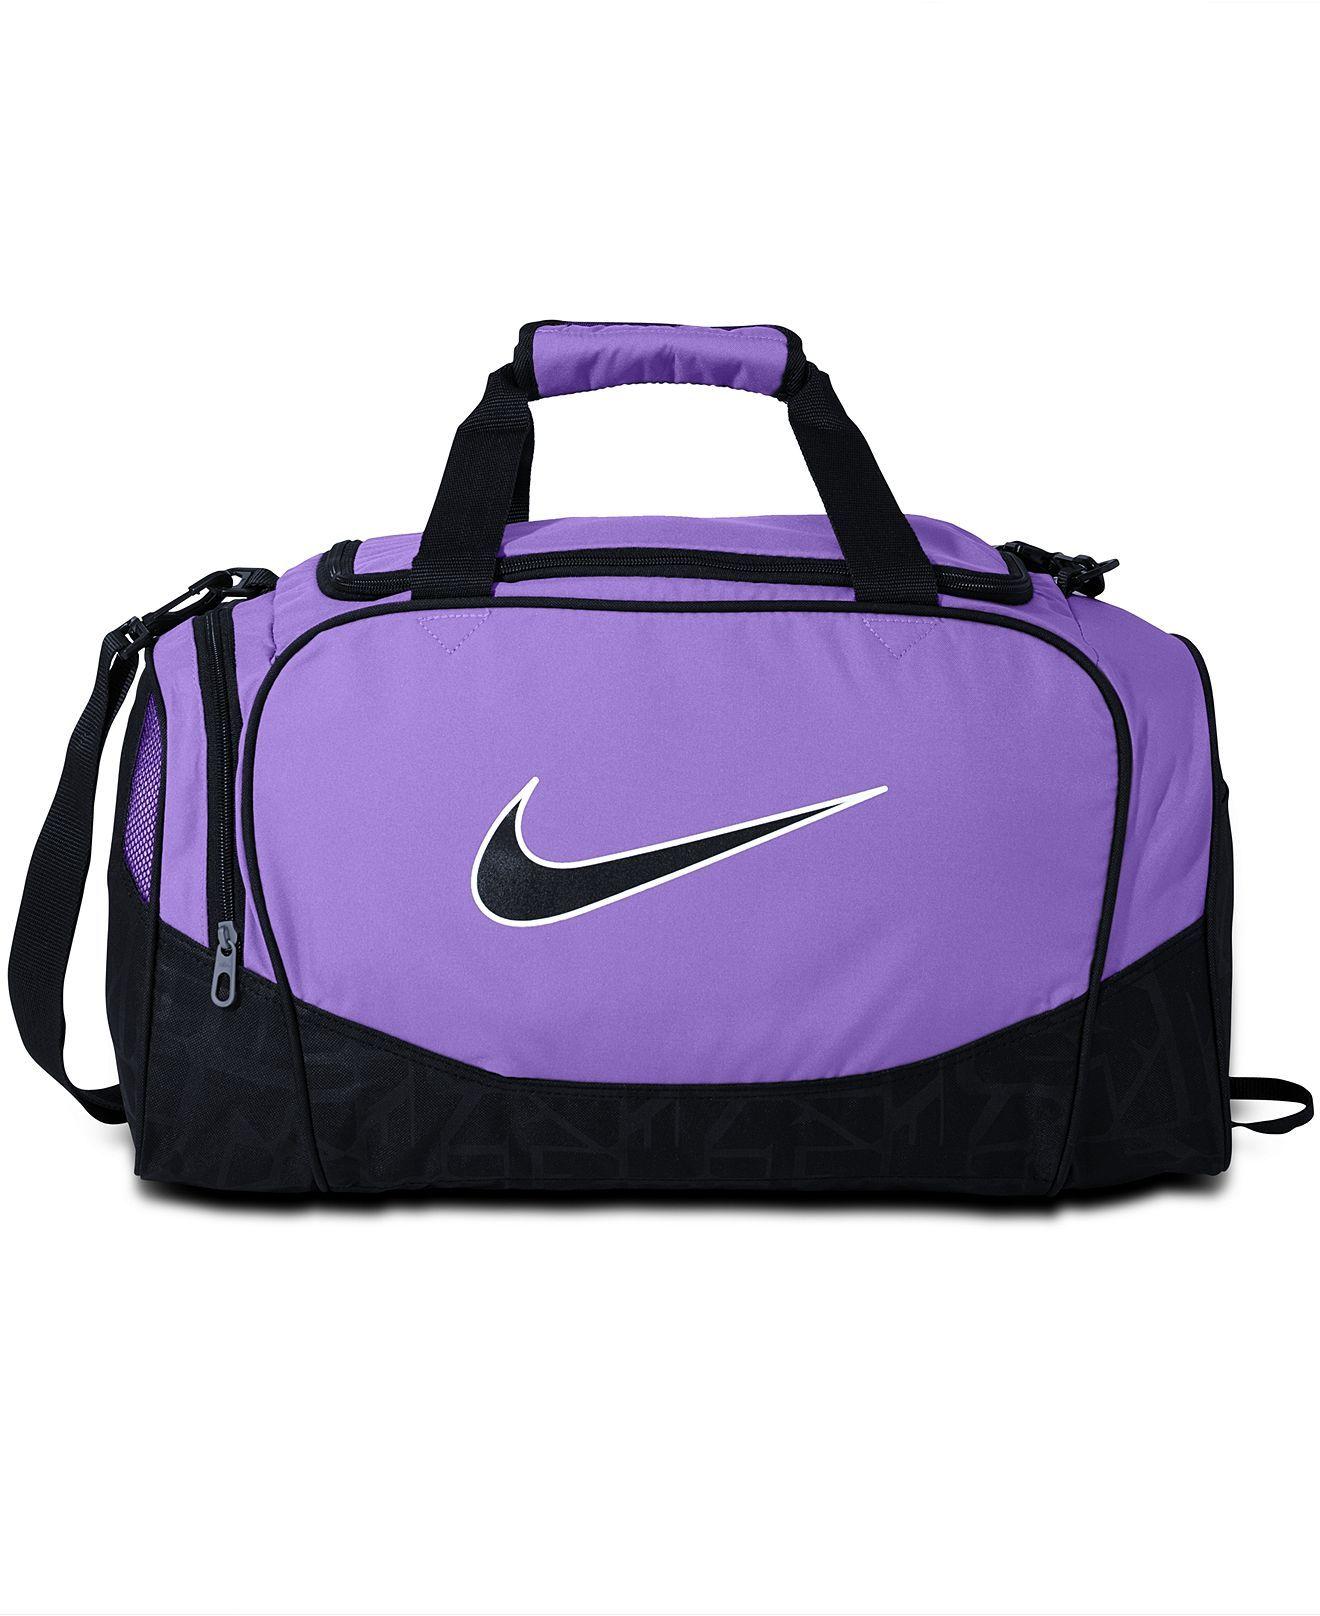 3d1ce6abe6 Nike Bag